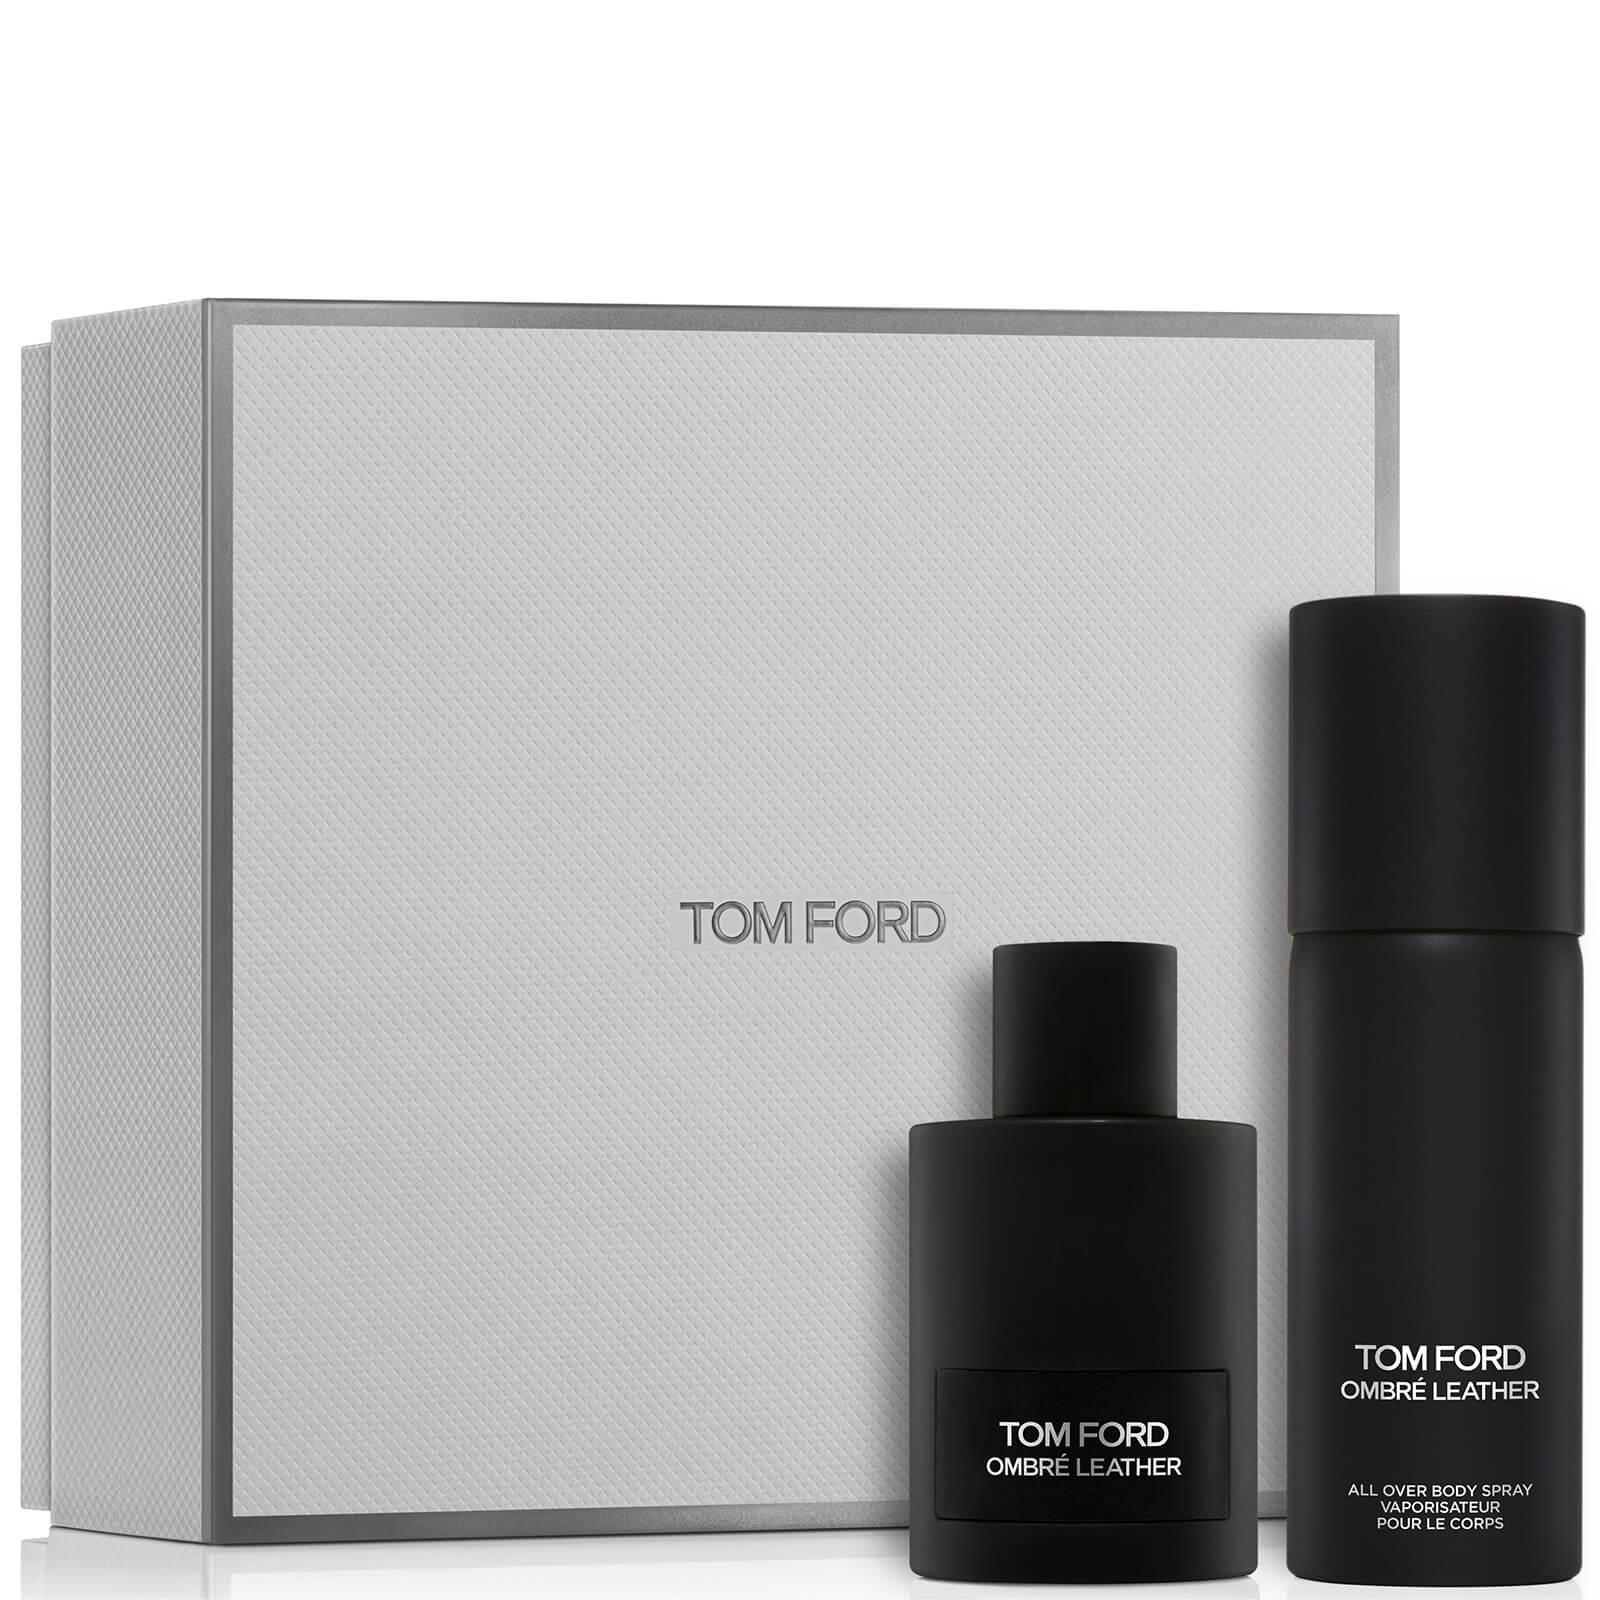 Купить Tom Ford Ombre Leather 100ml & Aob Set